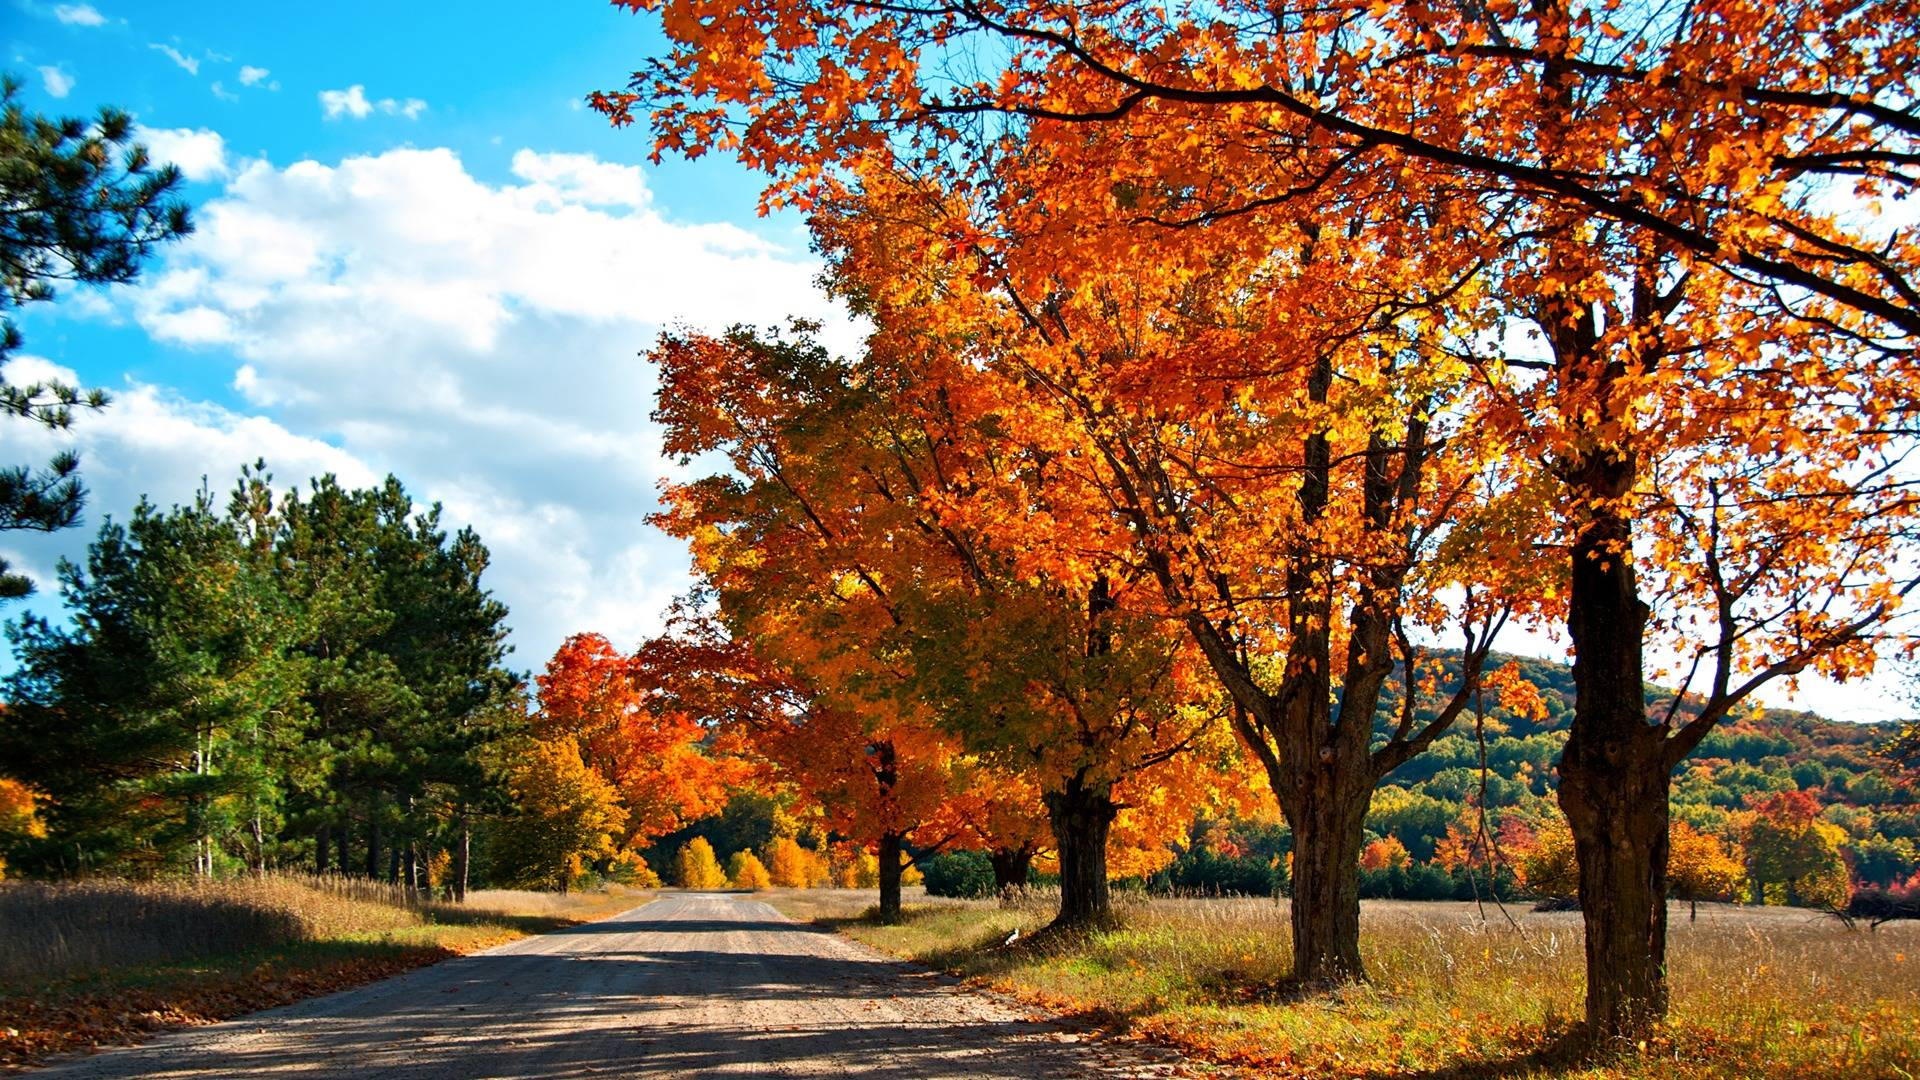 Hd Wallpaper Fall Leaf Change Autumn Wallpaper Hd Let You Feel The Magic Of Fall